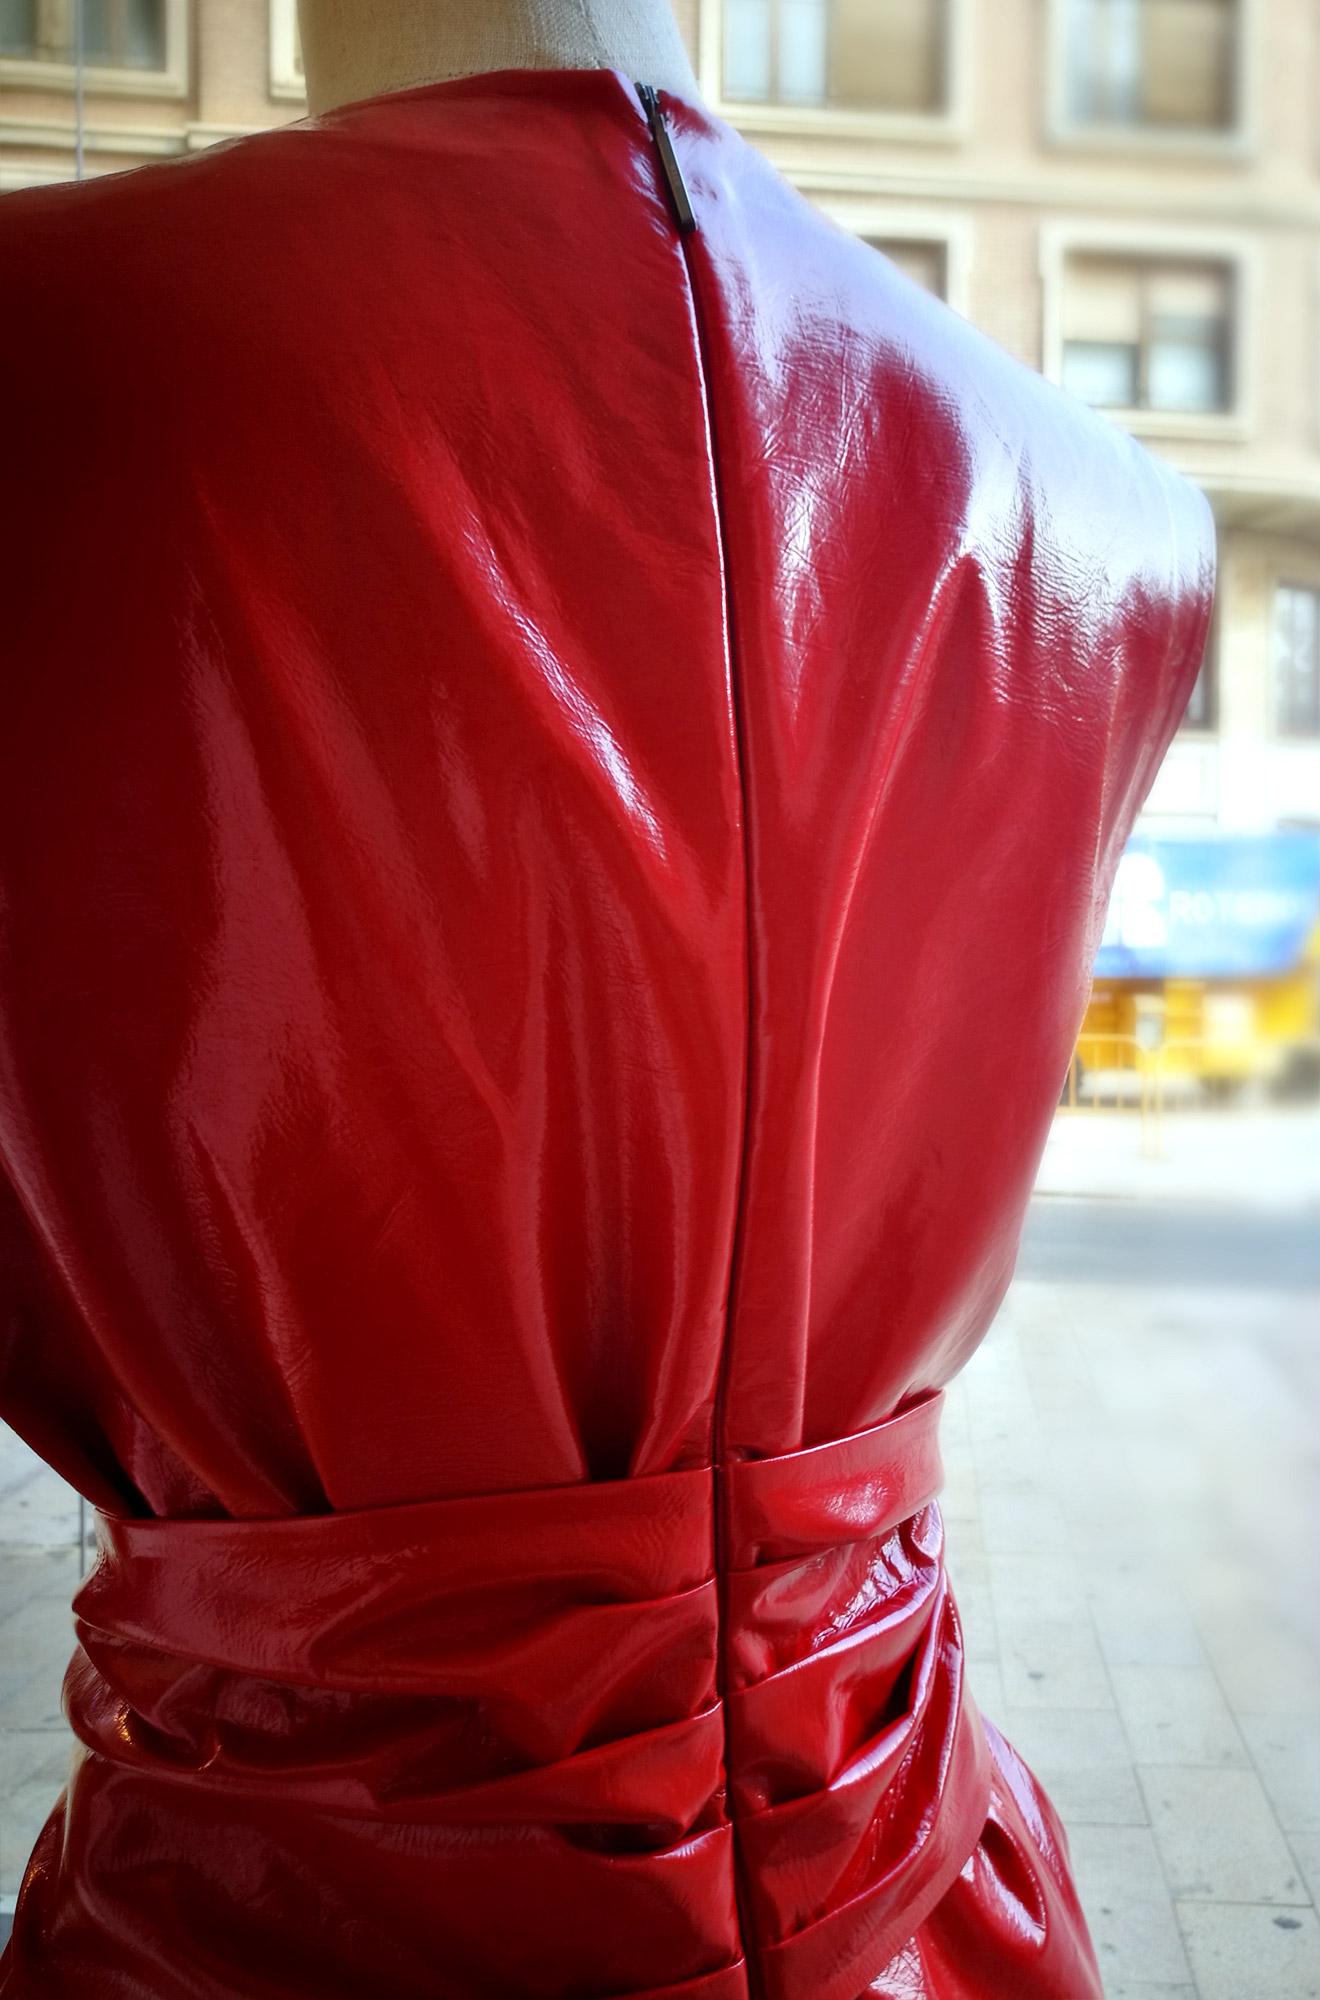 477867999cff5 Moda otoño invierno mujer valencia españa fashion jpg 1320x2000 Rojo botas  andrea otoño invierno 2018